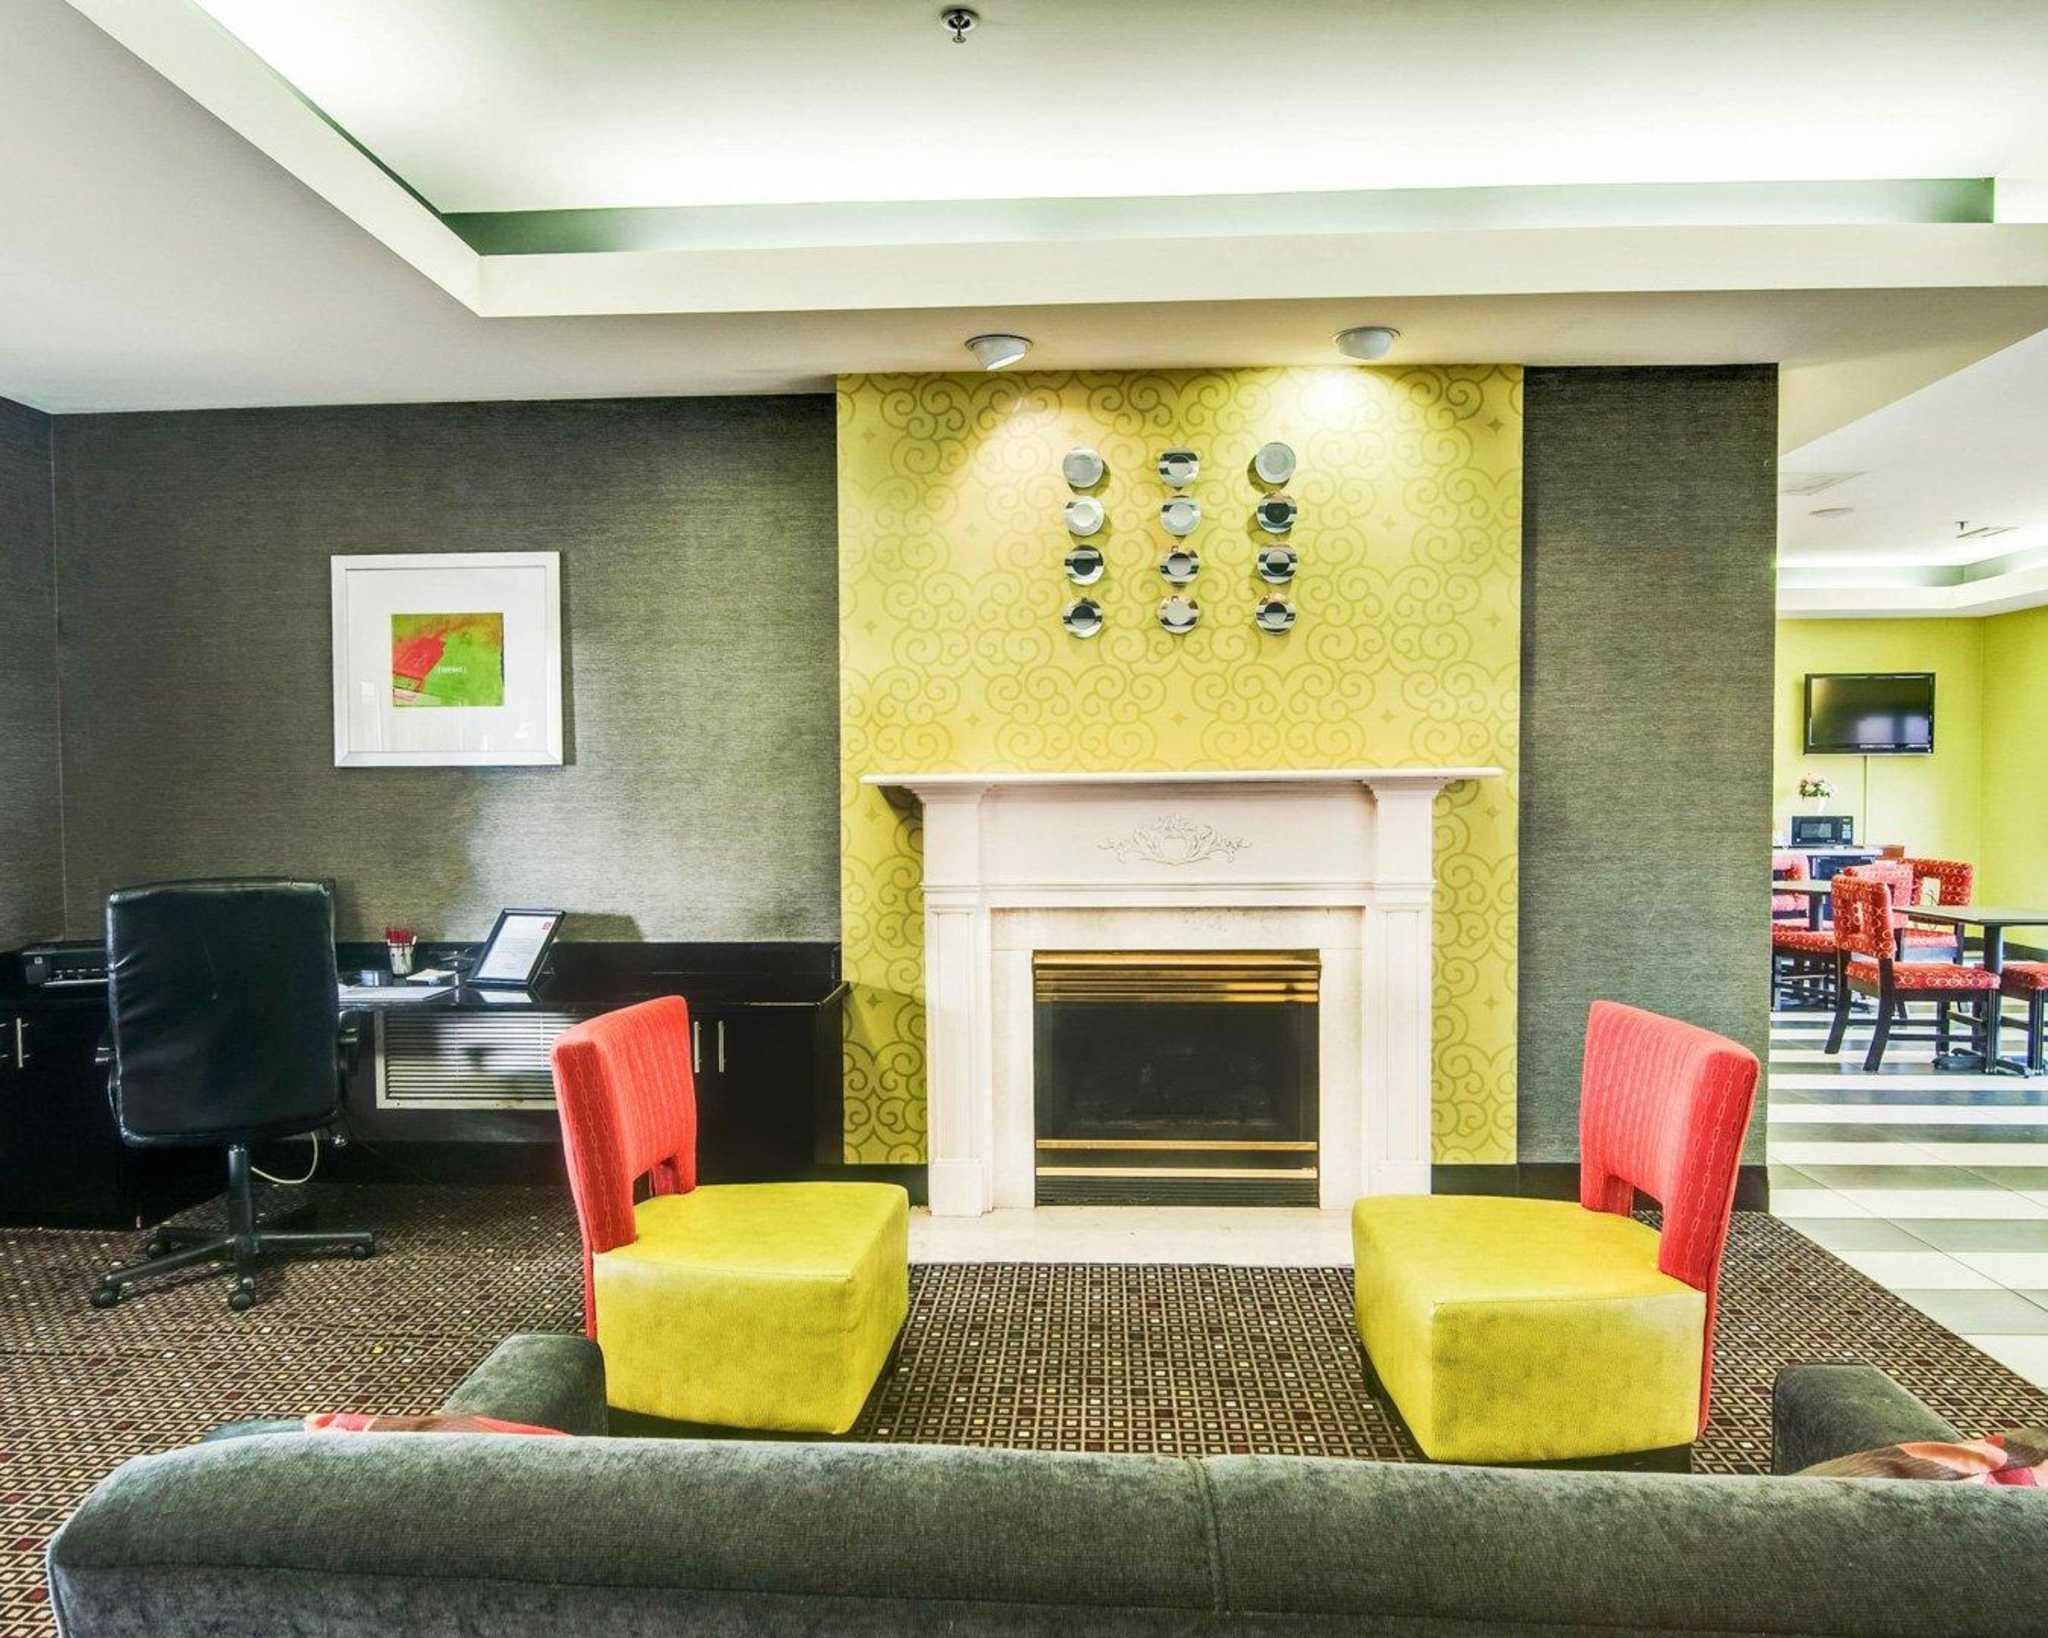 Comfort Suites Inn at Ridgewood Farm image 12